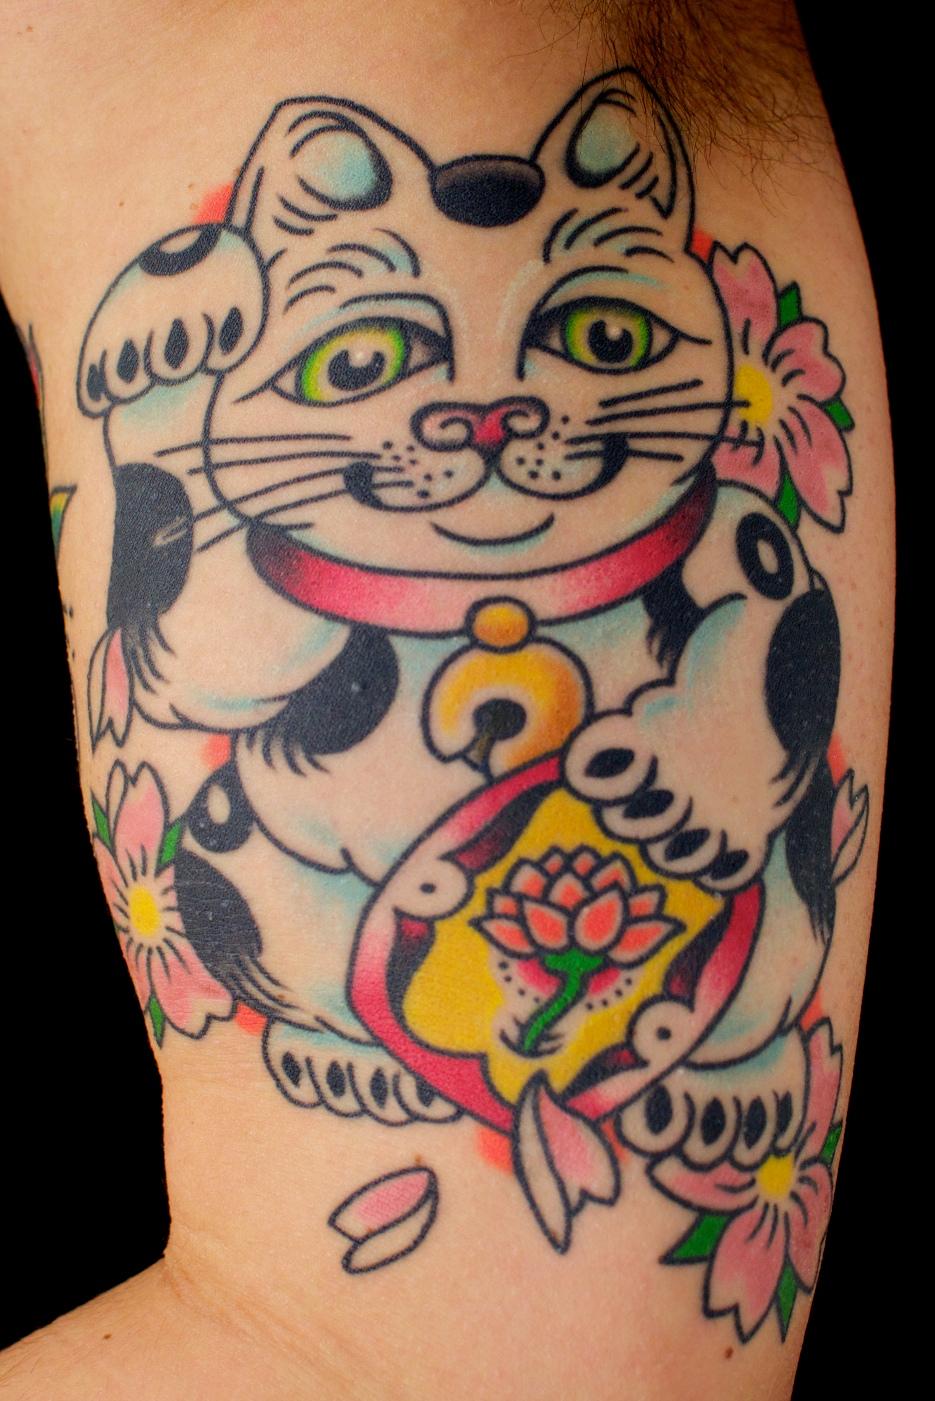 01052013 Tattoos 09 35.jpg